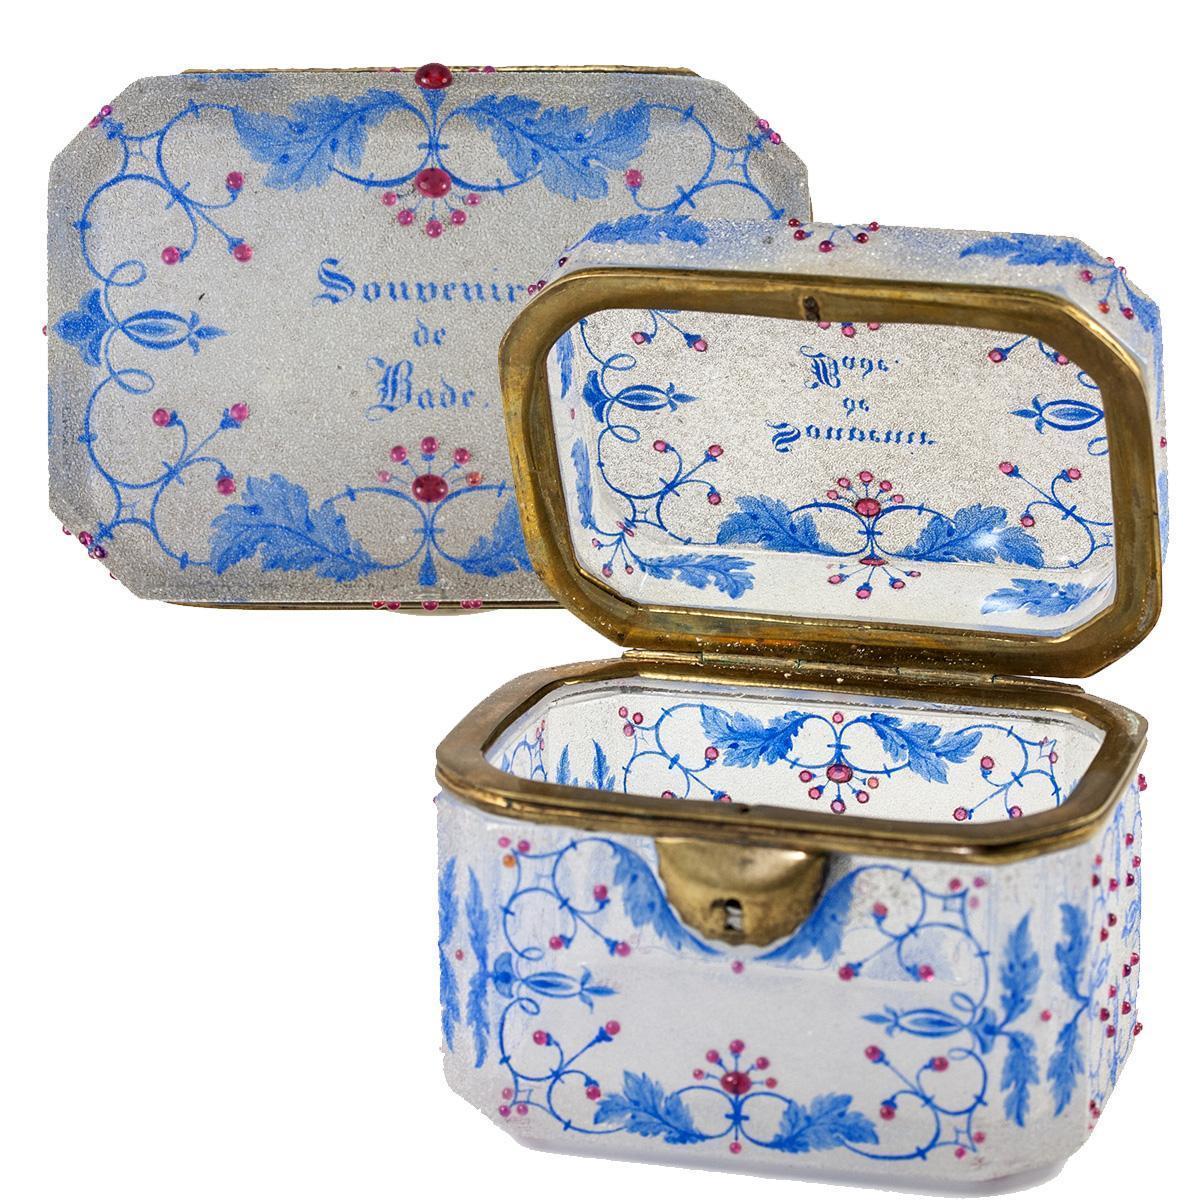 Antique Moser Bohemian Souvenir Sugar Casket, Box, Crackle Glass with Raised Jewel Dots, no Key